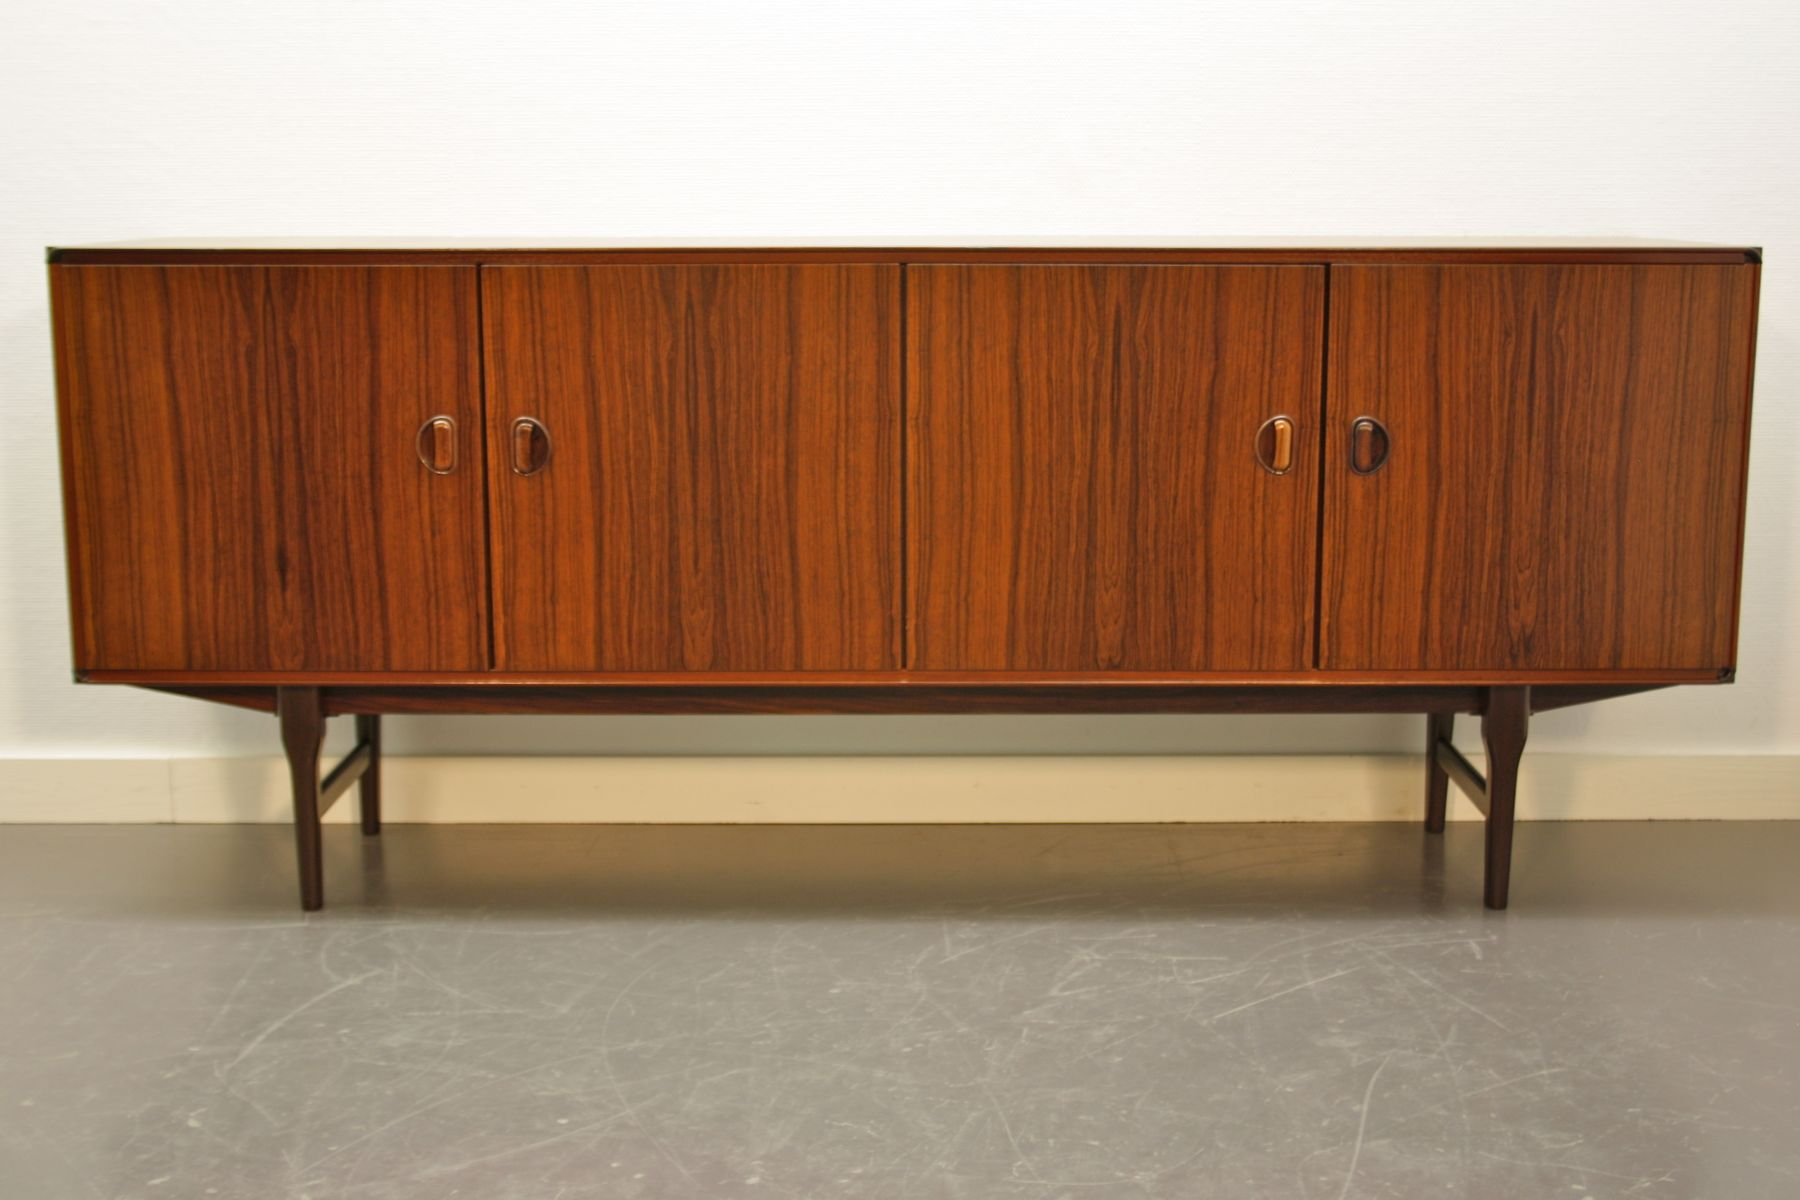 palisander sideboard von fristho franeker bei pamono kaufen. Black Bedroom Furniture Sets. Home Design Ideas